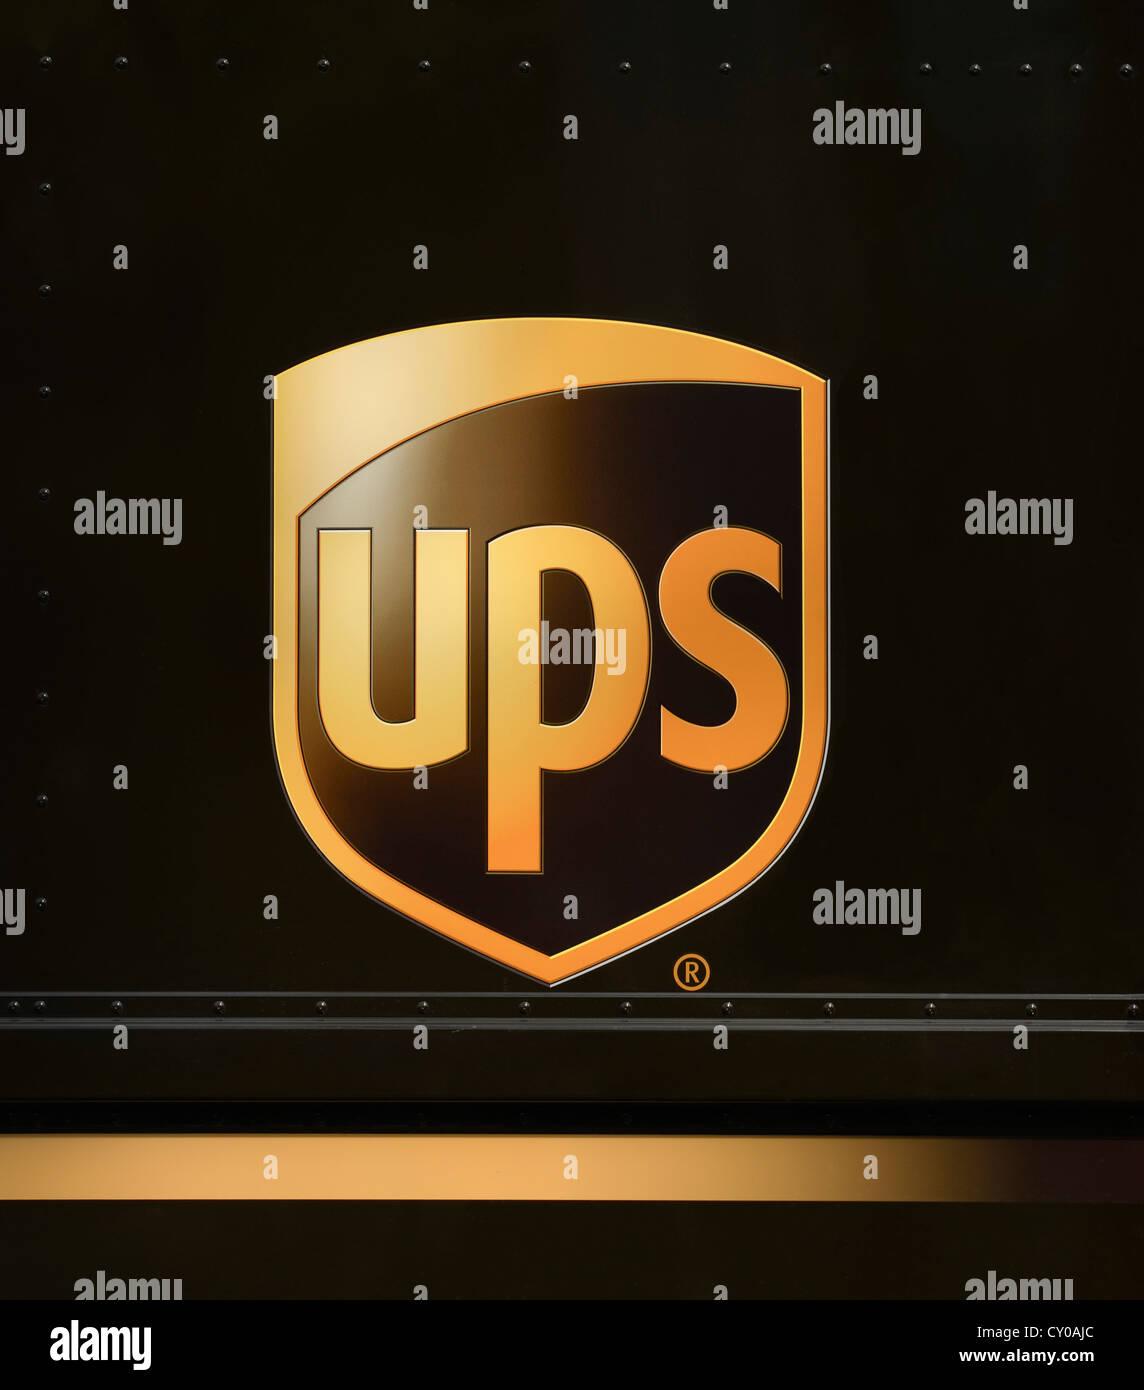 Logo, UPS, United Parcel Service - Stock Image